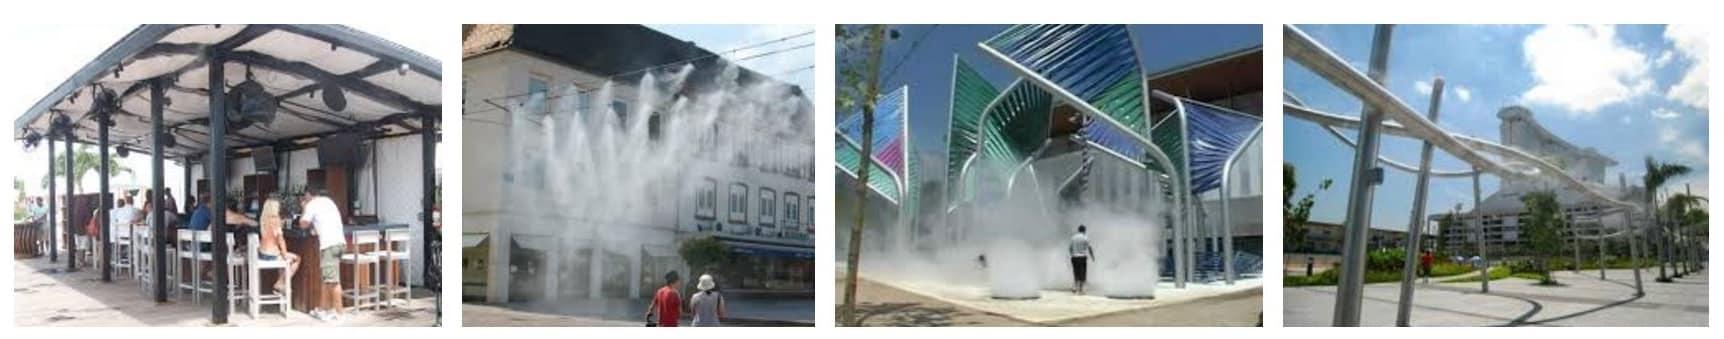 Outdoor cooling & misting | Dubai | Abu Dhabi | UAE | - Desert Cooler